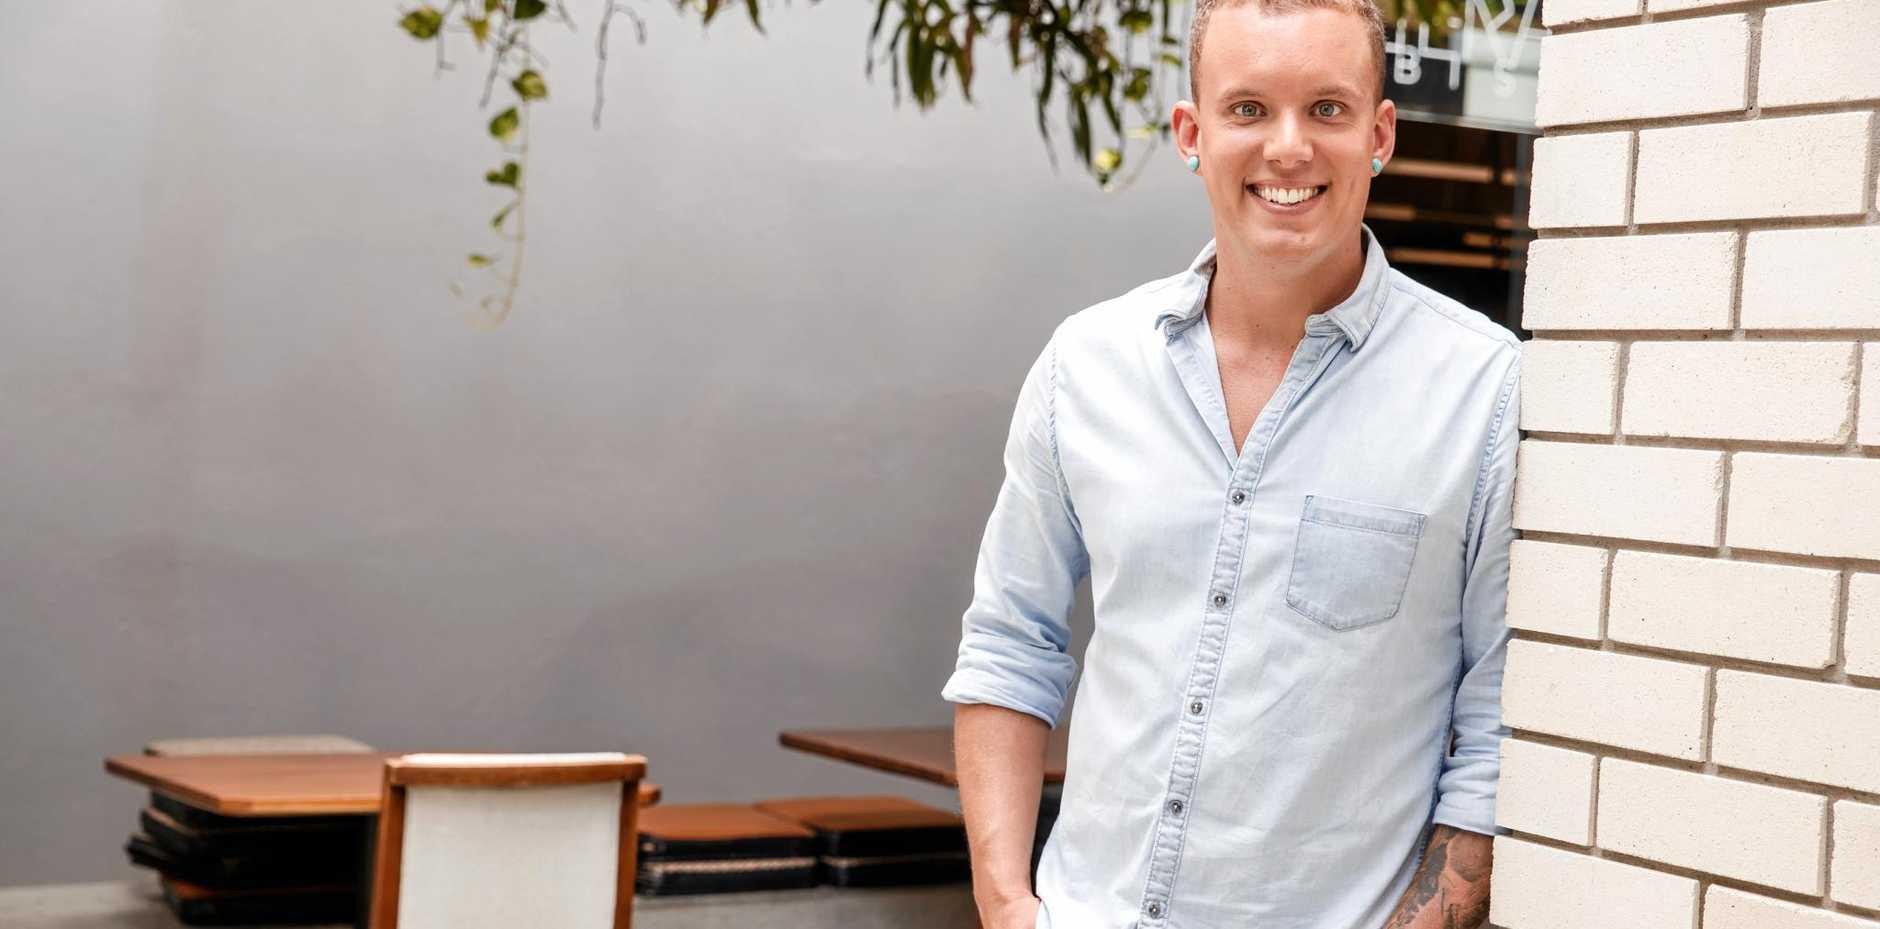 ON TOP: Noosa chef Matt Sinclair has been named the social media ambassador for Silver Chef.